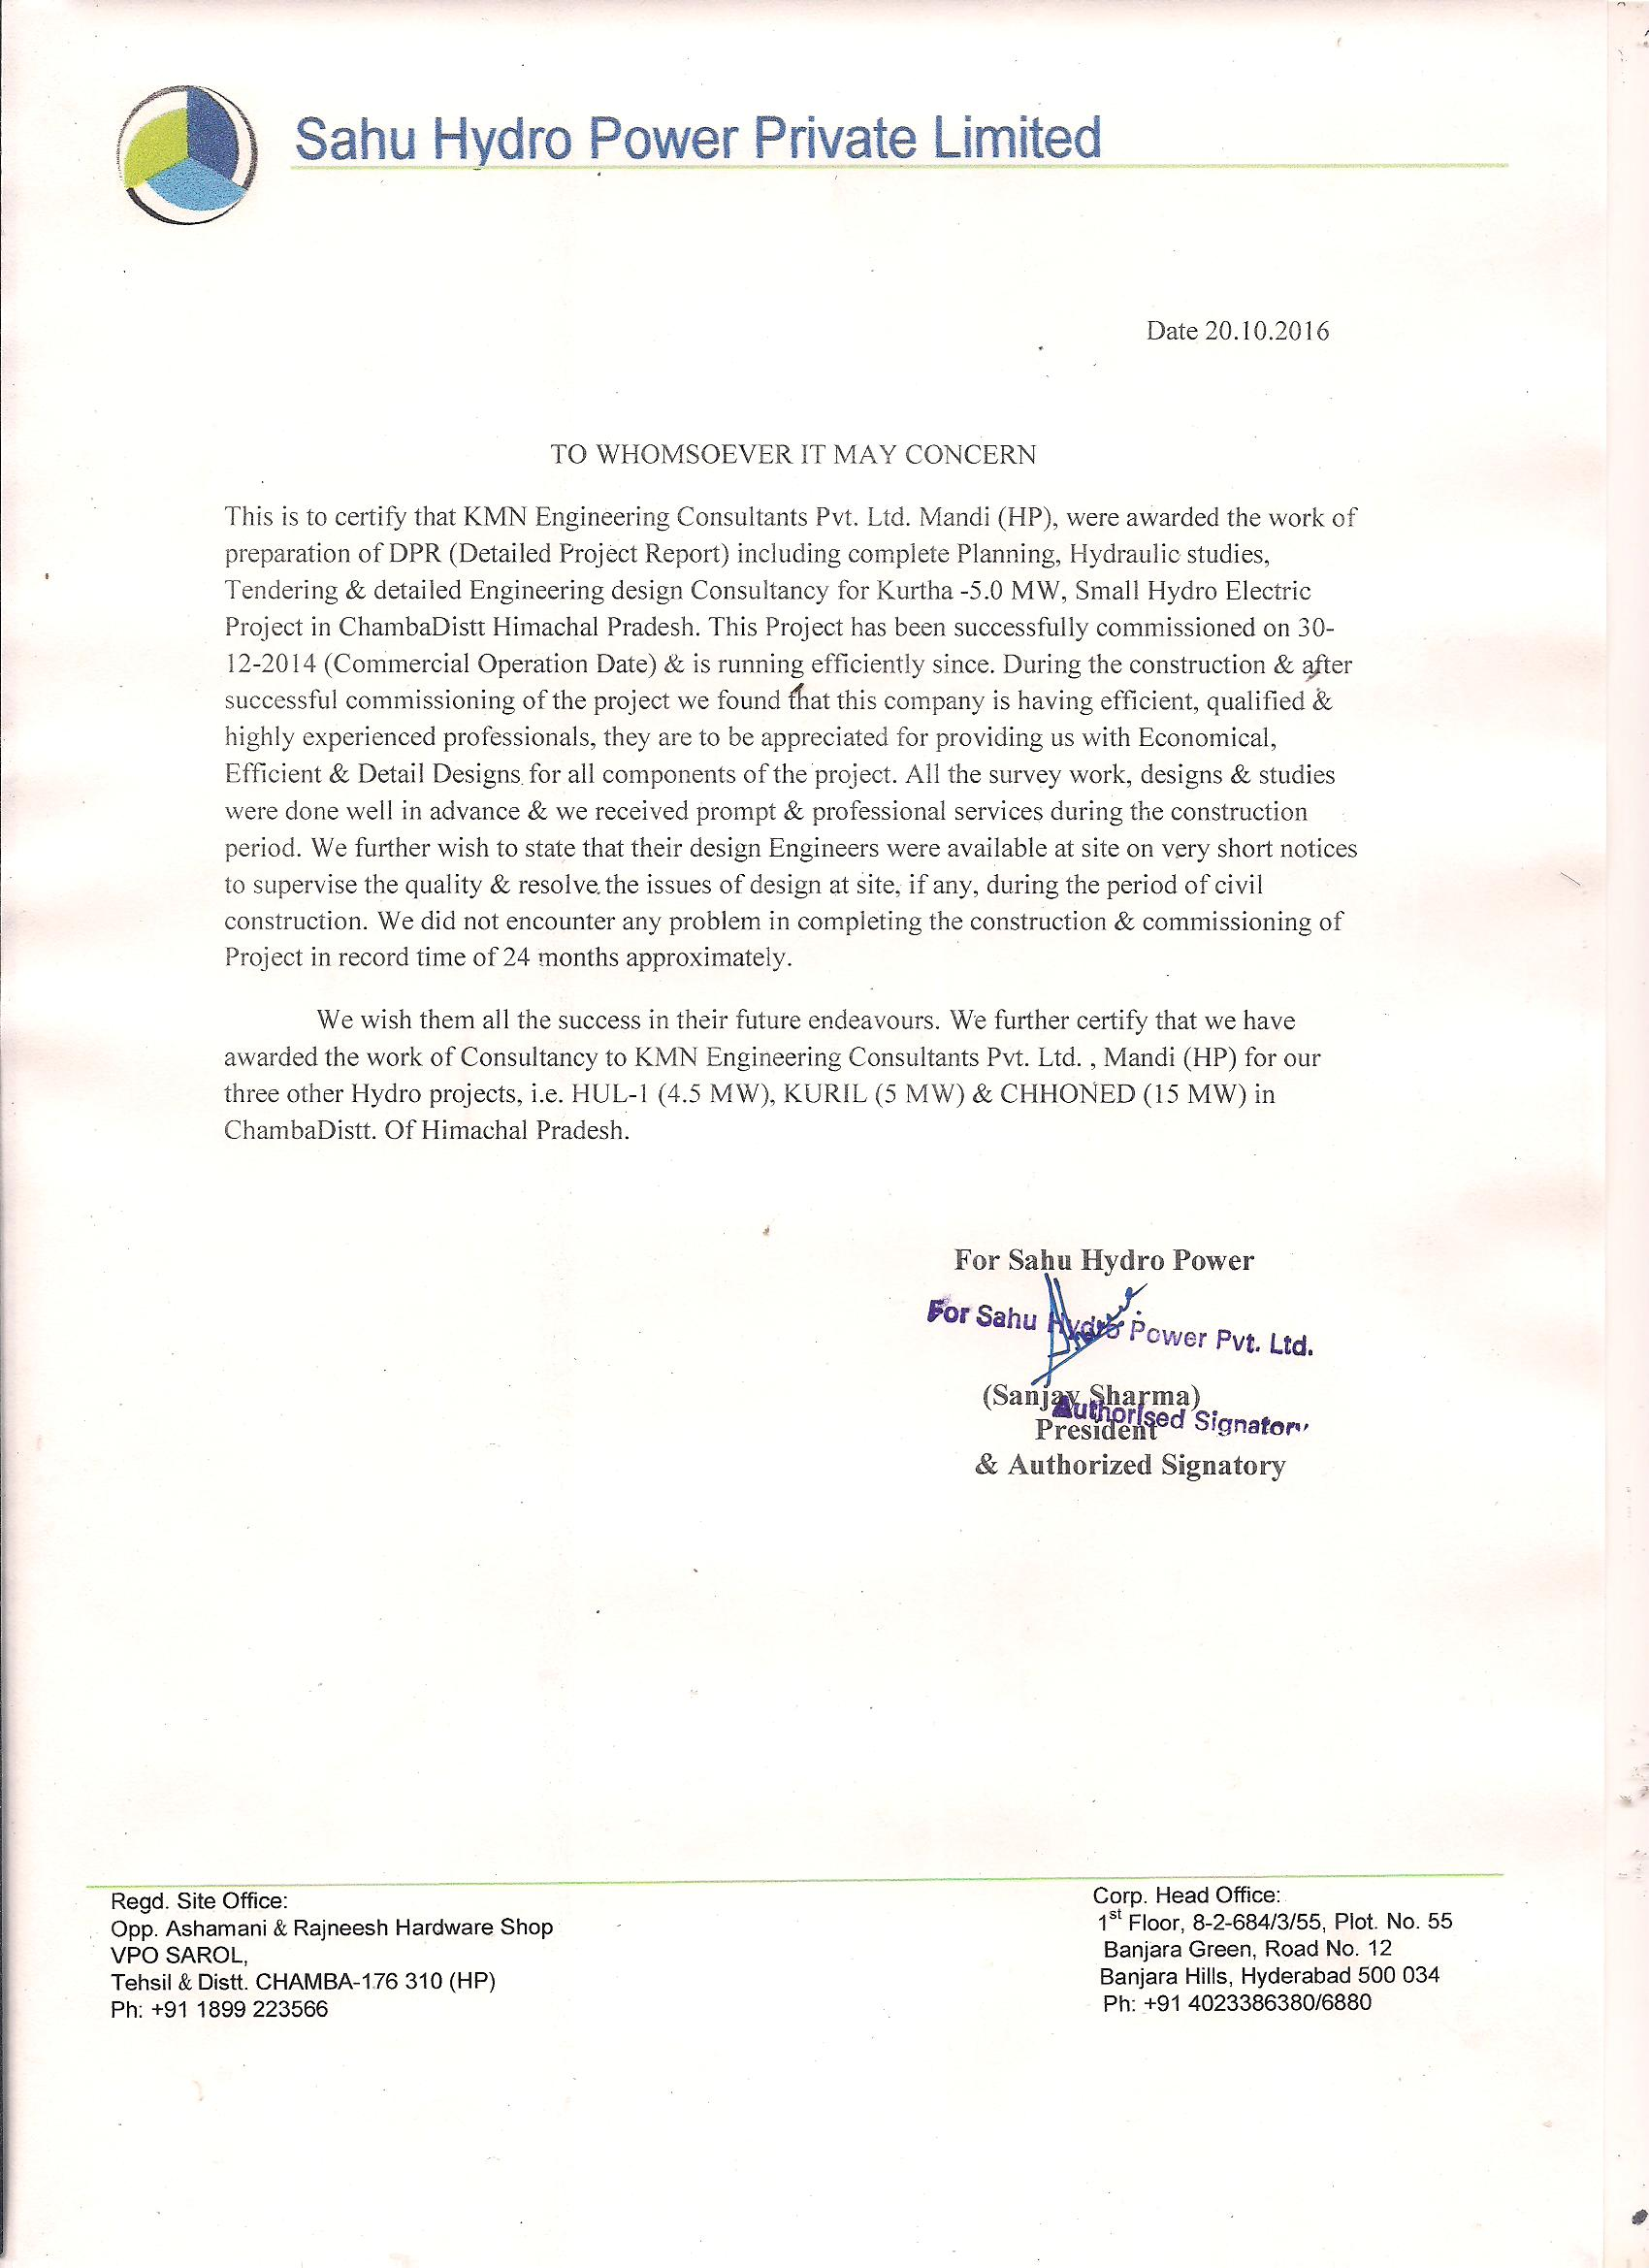 Kurtha appreciation certificate